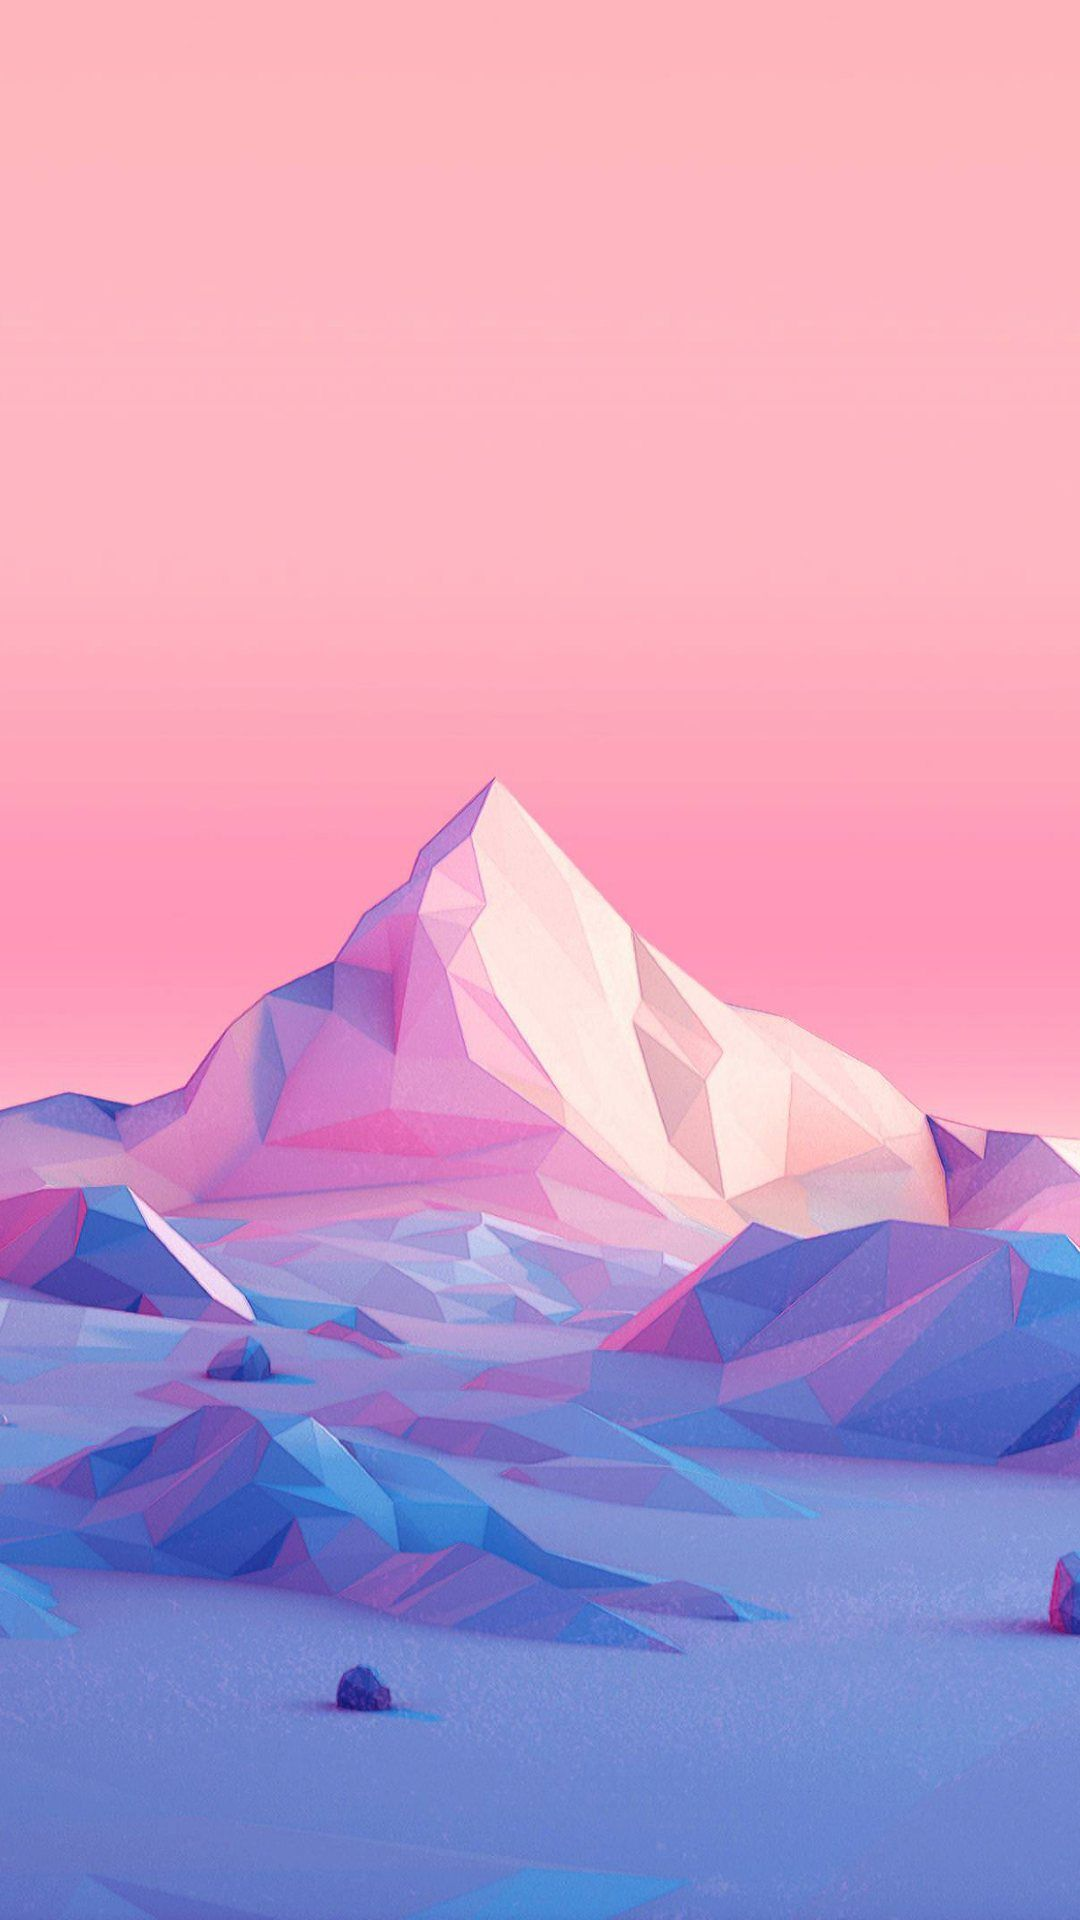 Minimalist Mountain Wallpaper 1080x1920 Mountain Wallpaper Iphone Wallpaper Mountains Android Wallpaper